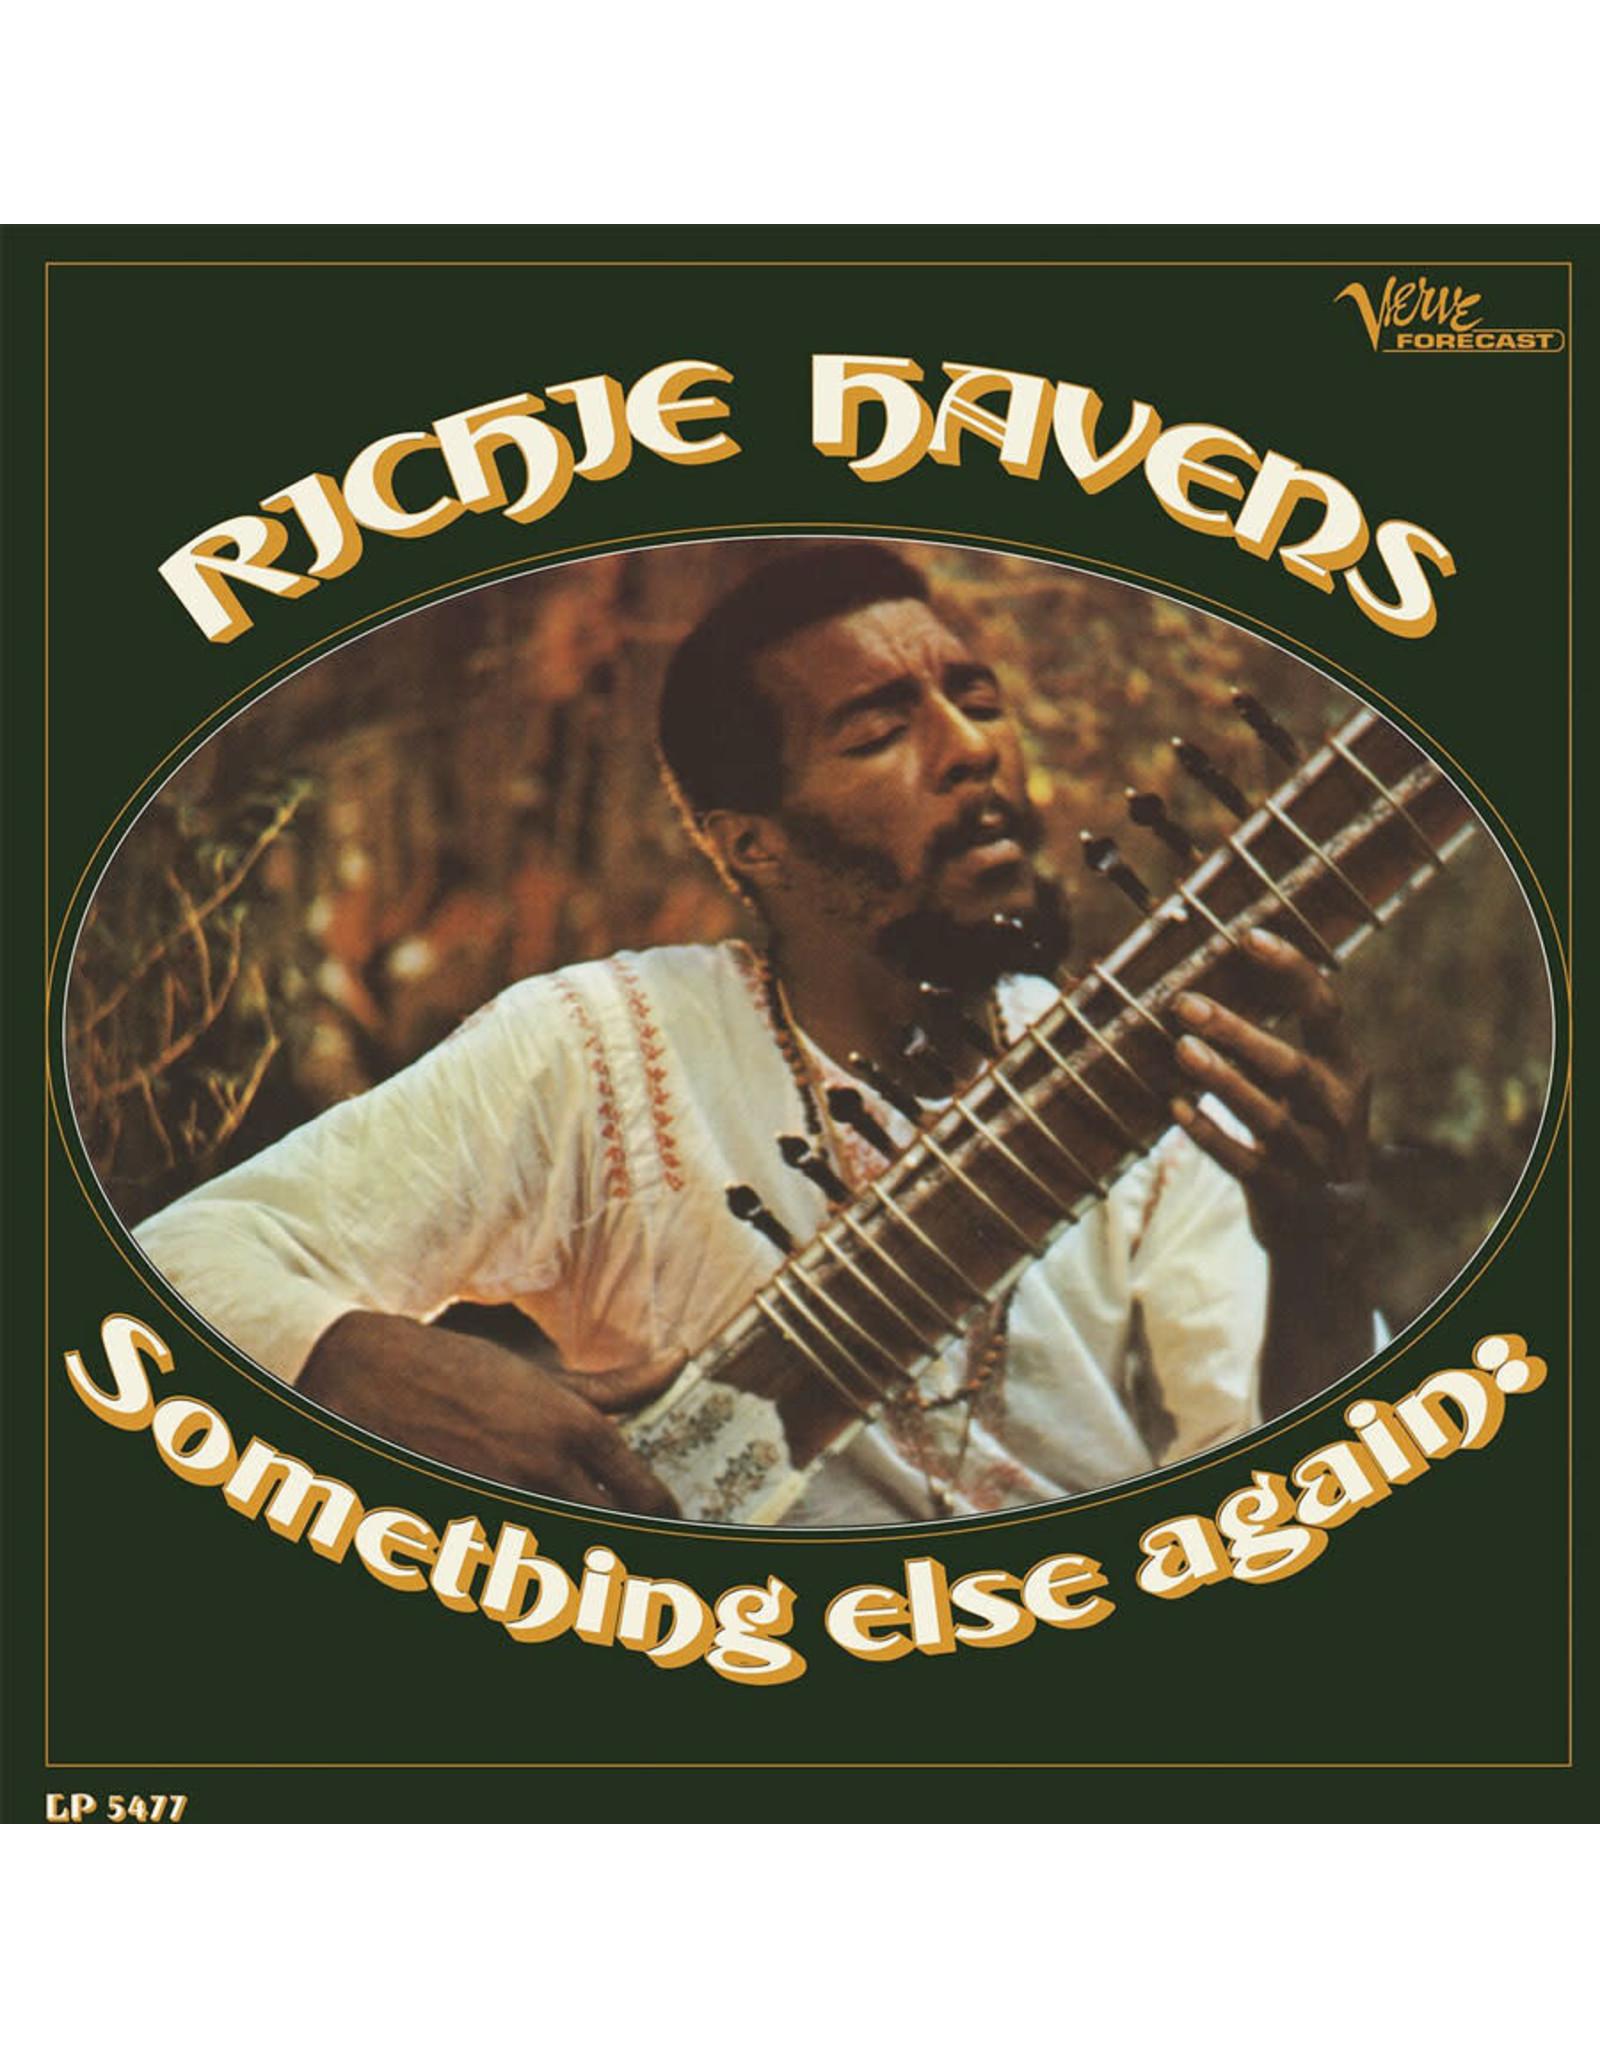 Vinyl Richtie Havens - Something Else Again. Final Sale